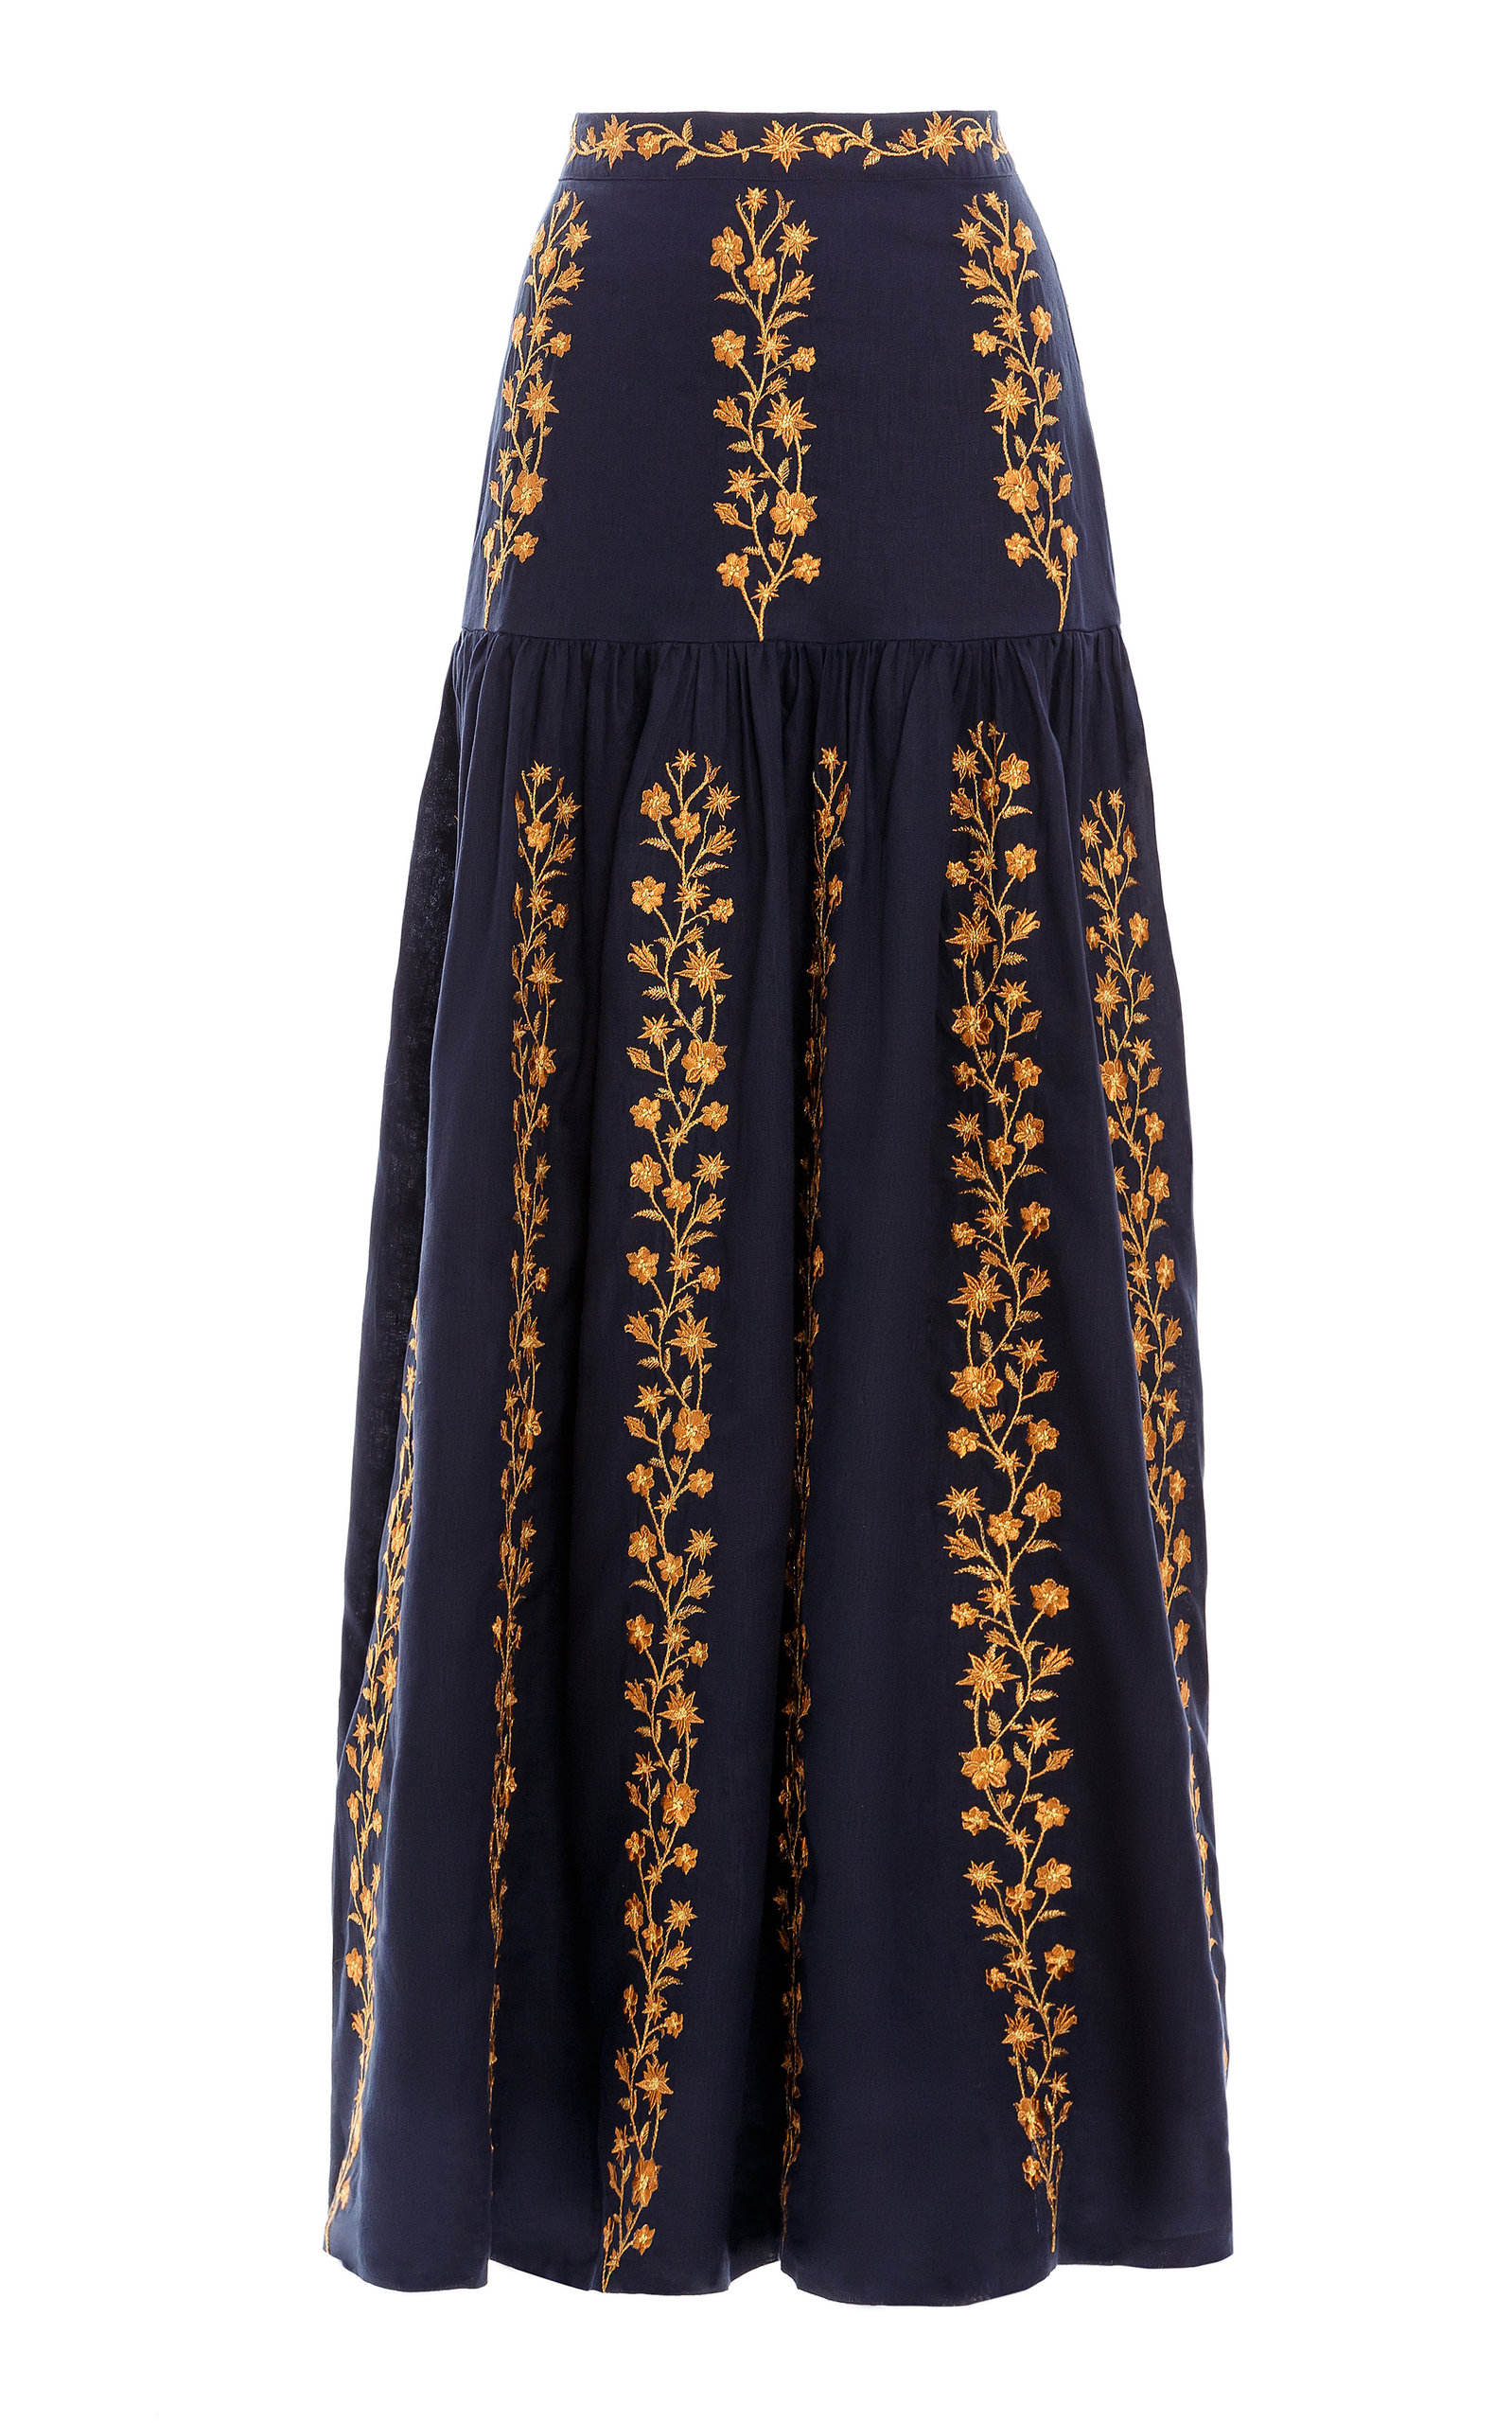 Women's Margarita Embroidered Linen Maxi Skirt